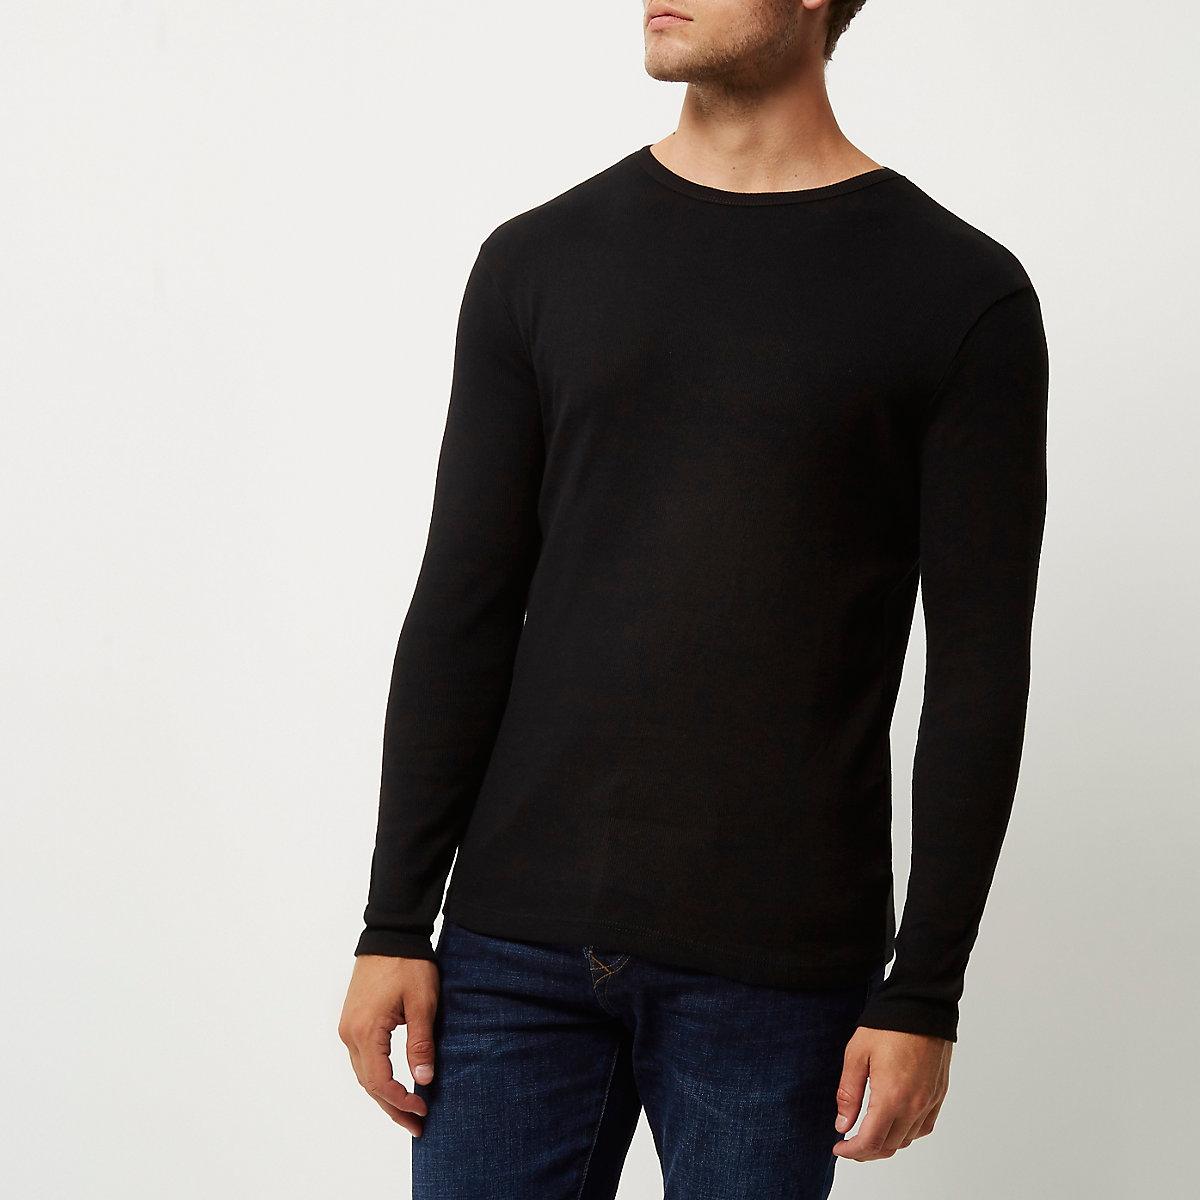 Black ribbed slim fit long sleeve T-shirt - Long Sleeve T-Shirts - T-Shirts    Vests - men 9343fac991ed